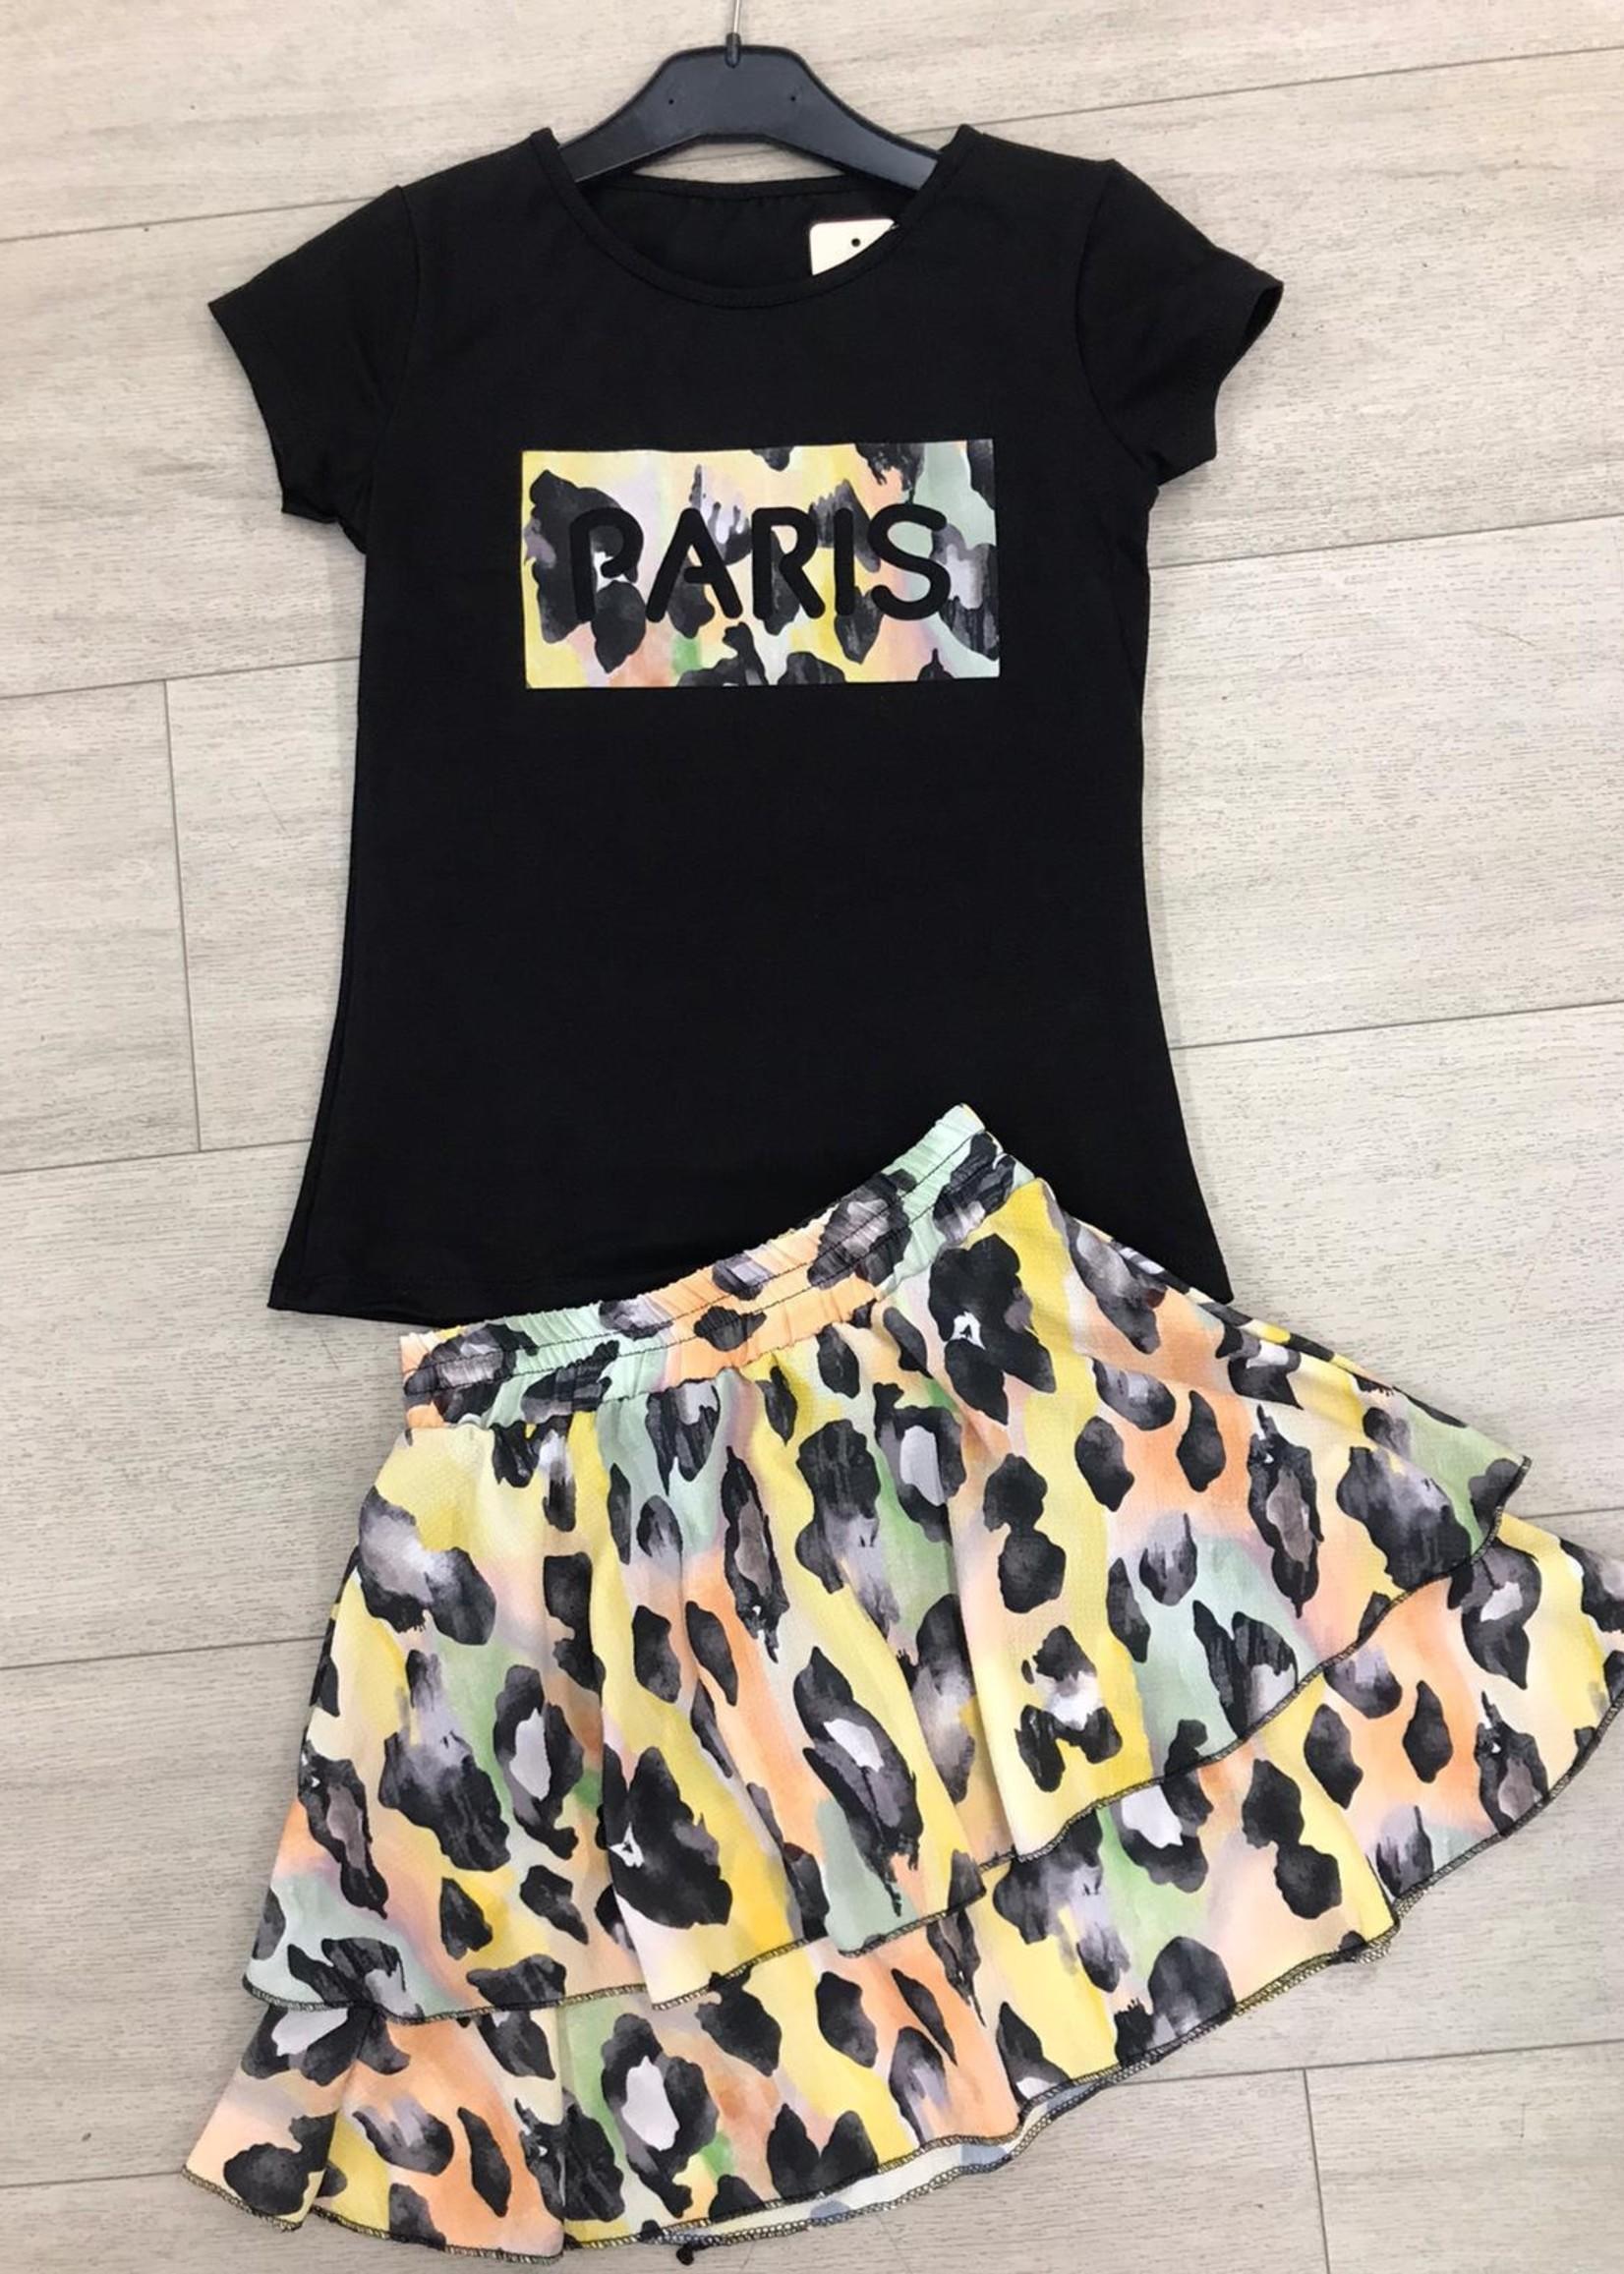 Divanis Divanis paris skirt set zwart geel